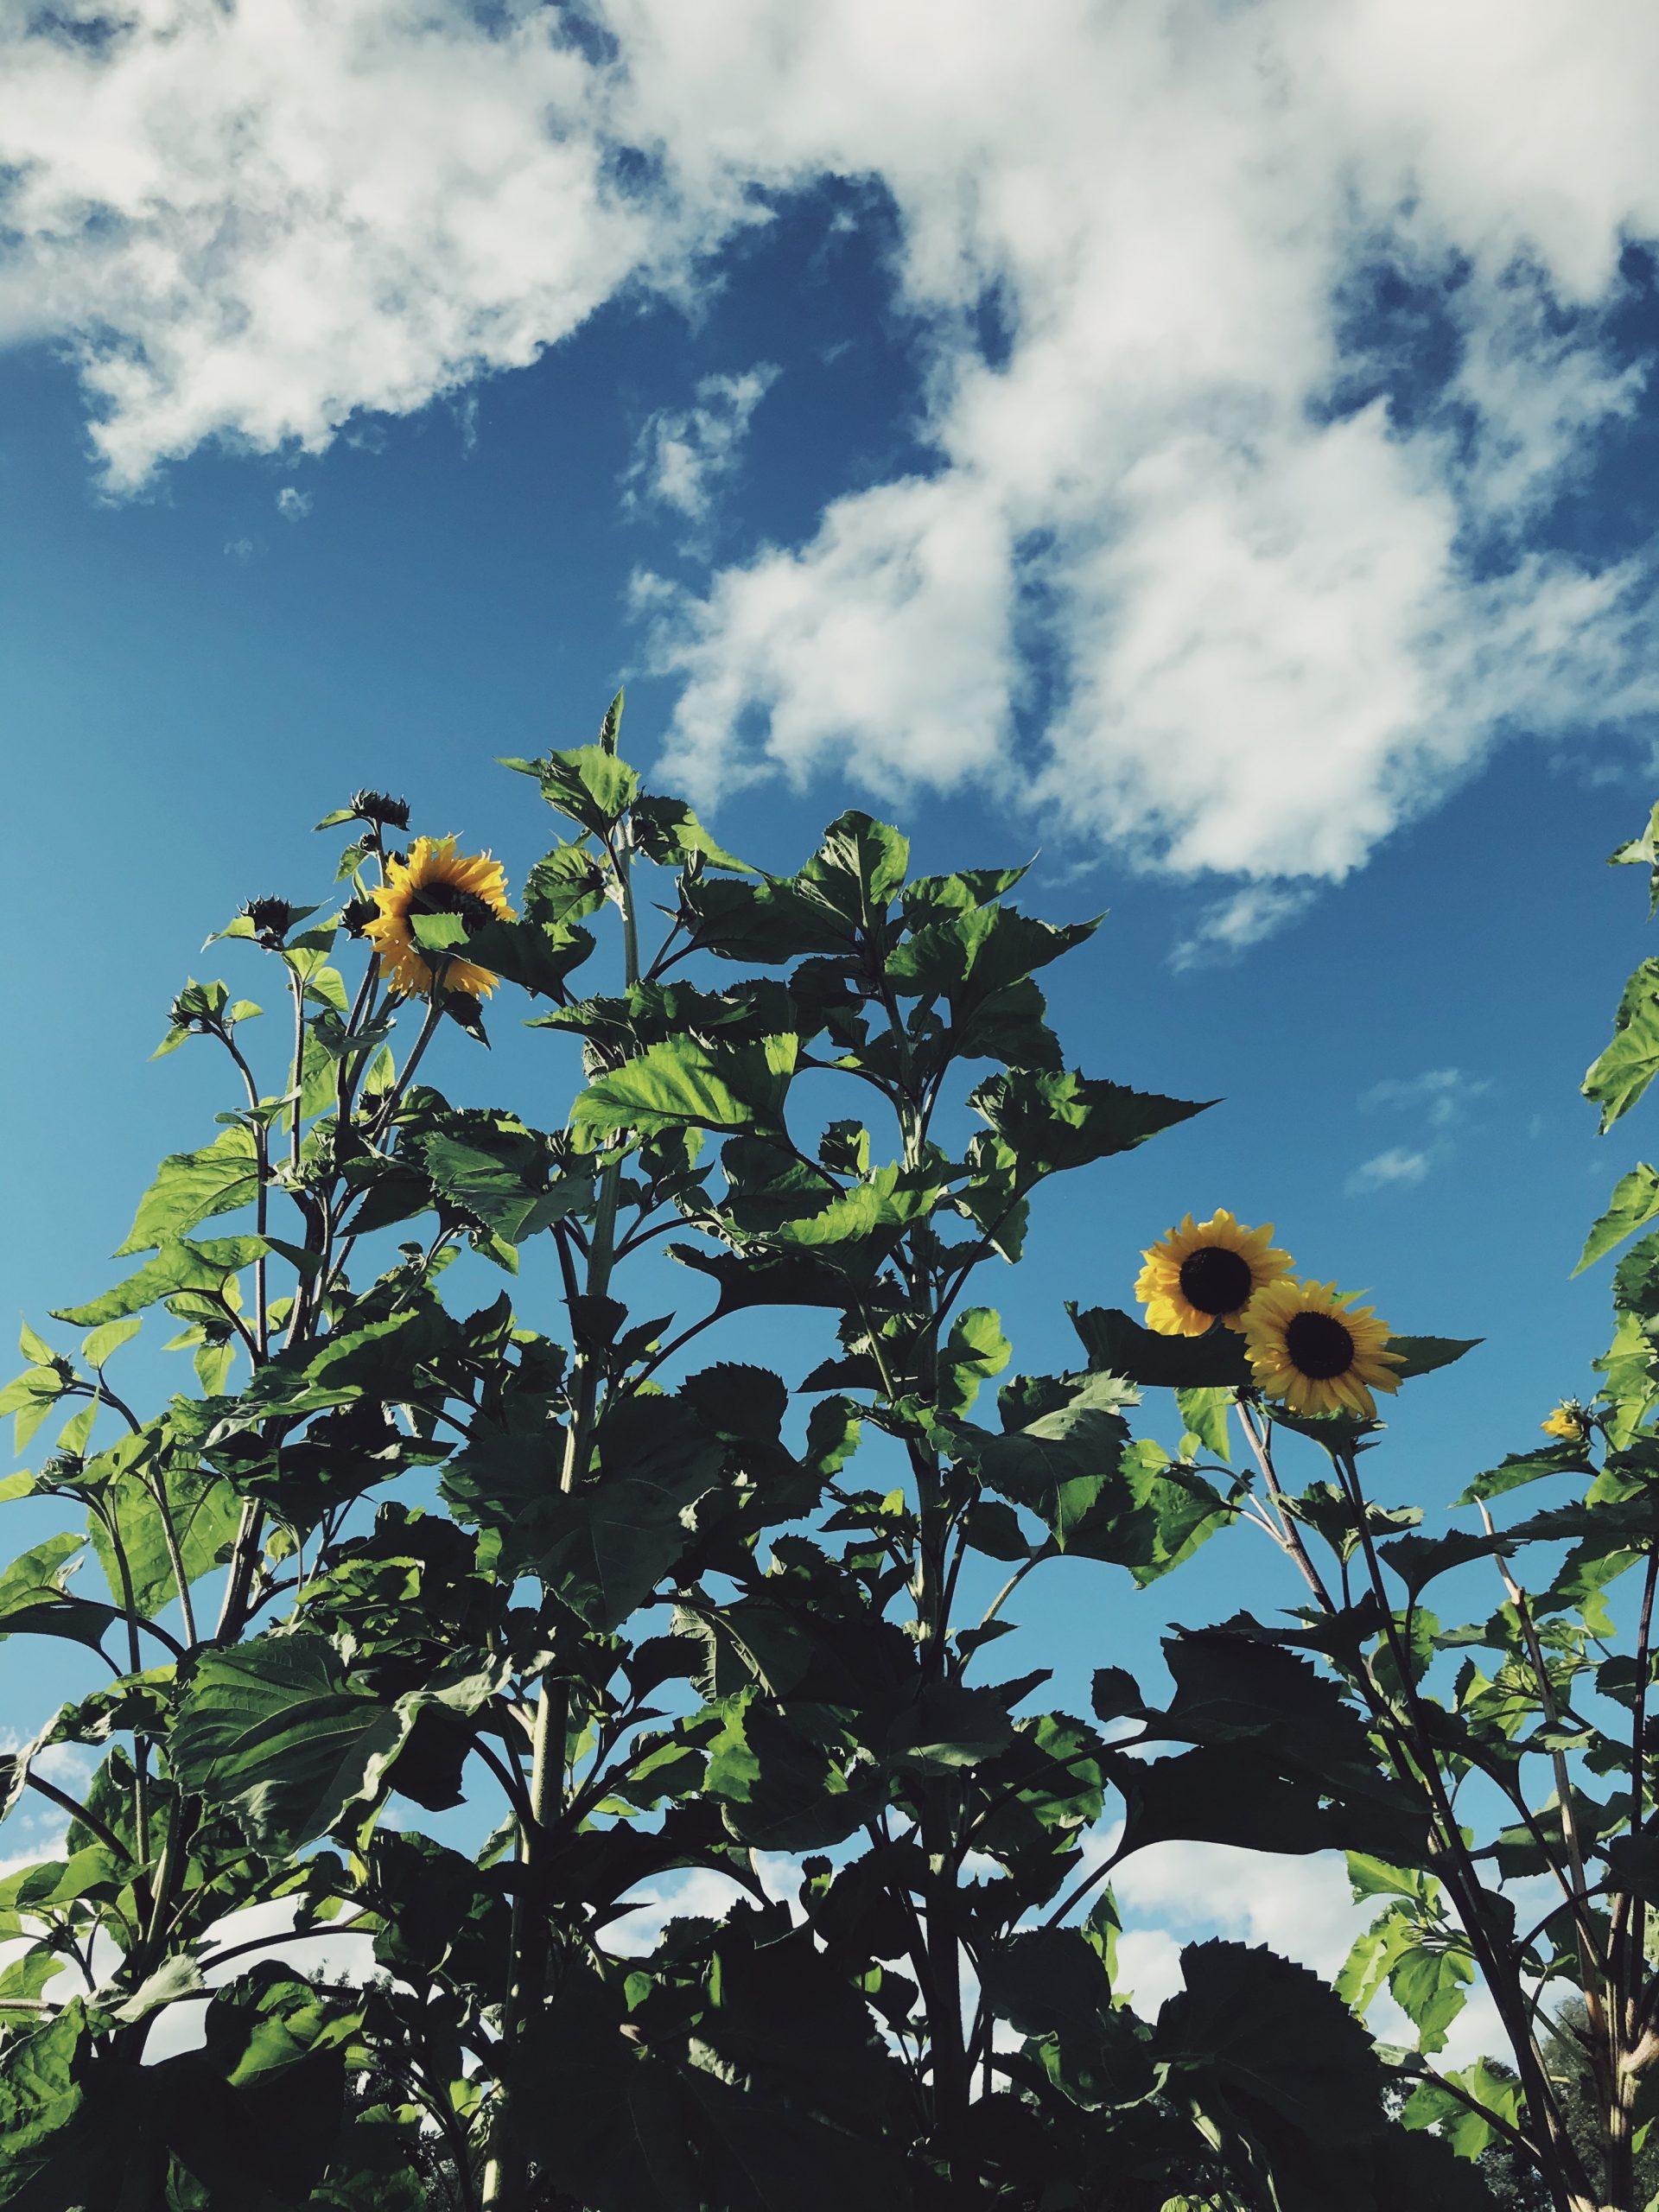 sunflower-solros-odla-gardening-odling